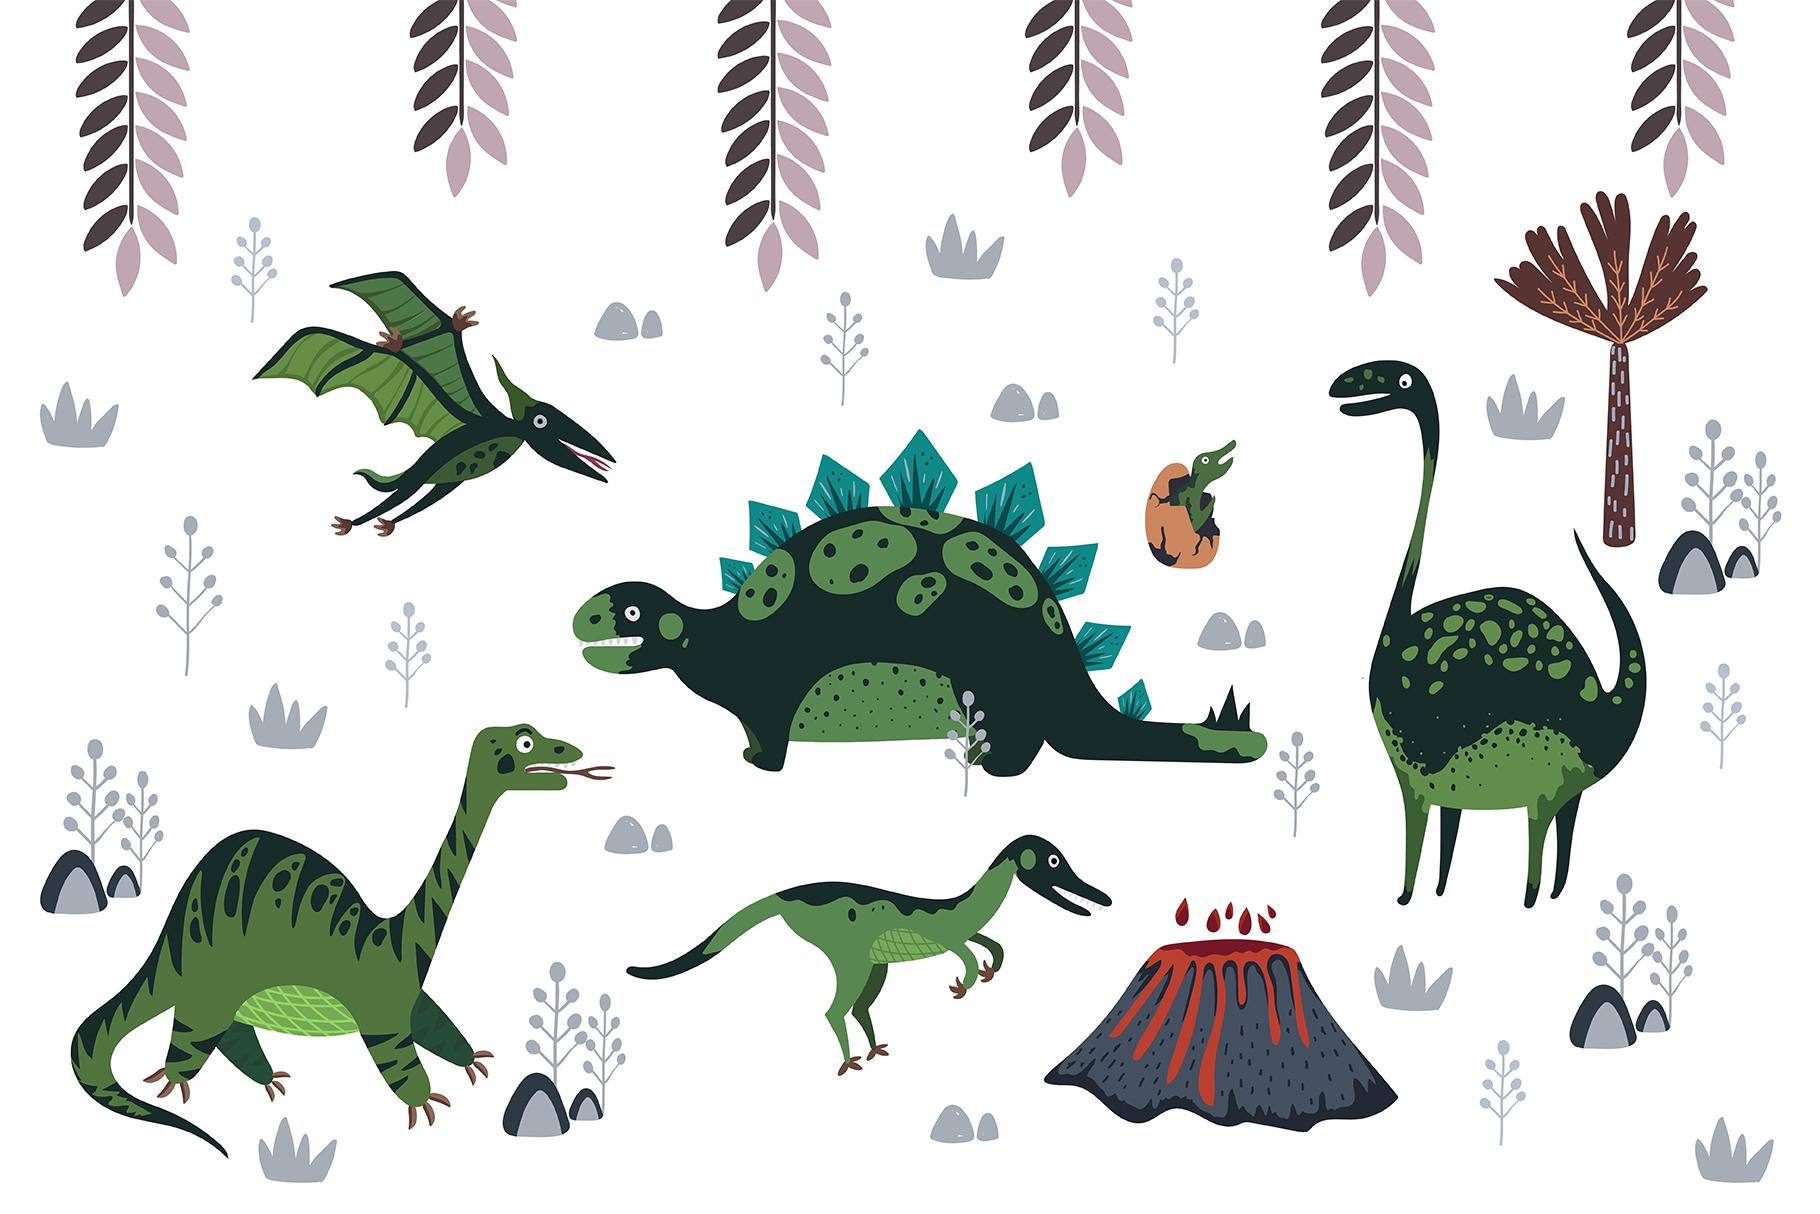 Cute cartoon dinosaurs example image 1